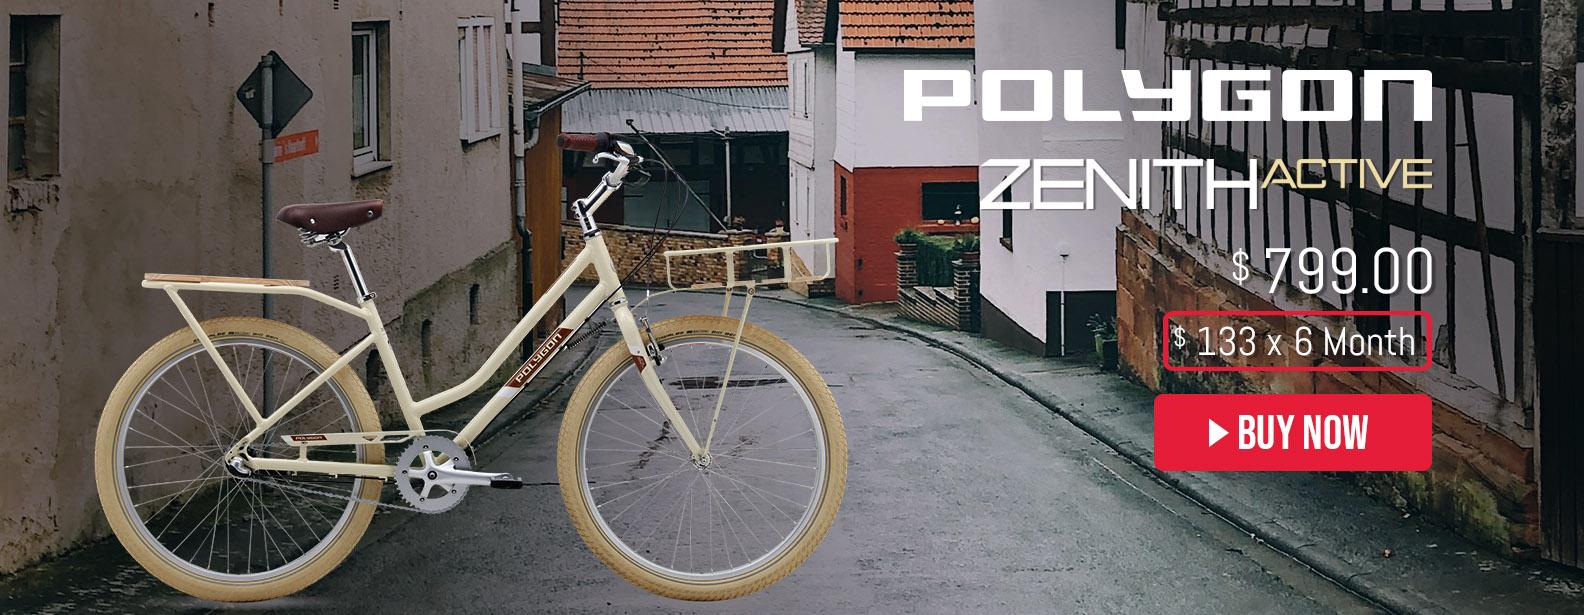 Polygon Zenith Active 3 City Bike